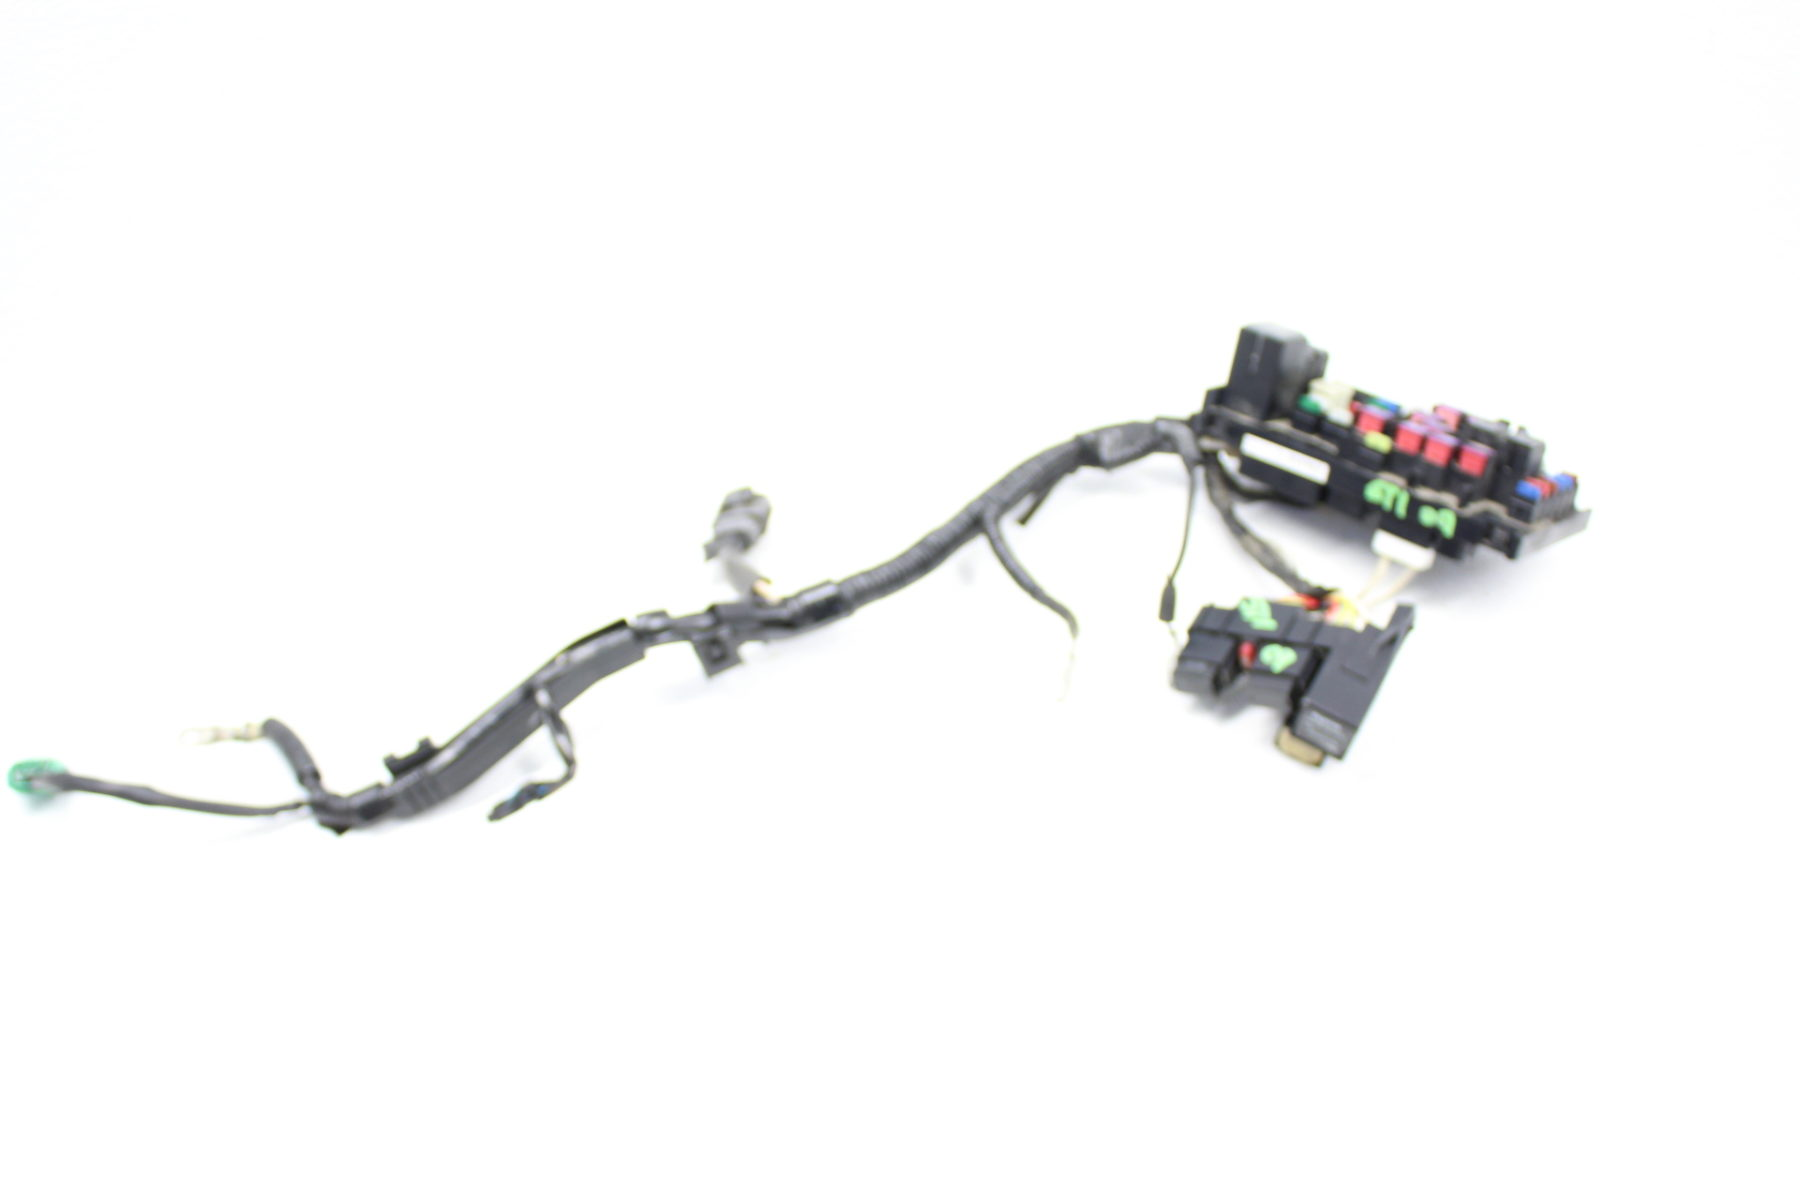 2008-2014 subaru wrx & sti fuse box wire wiring harness oem 82241fg020 –  subieautoparts.com  subieautoparts.com